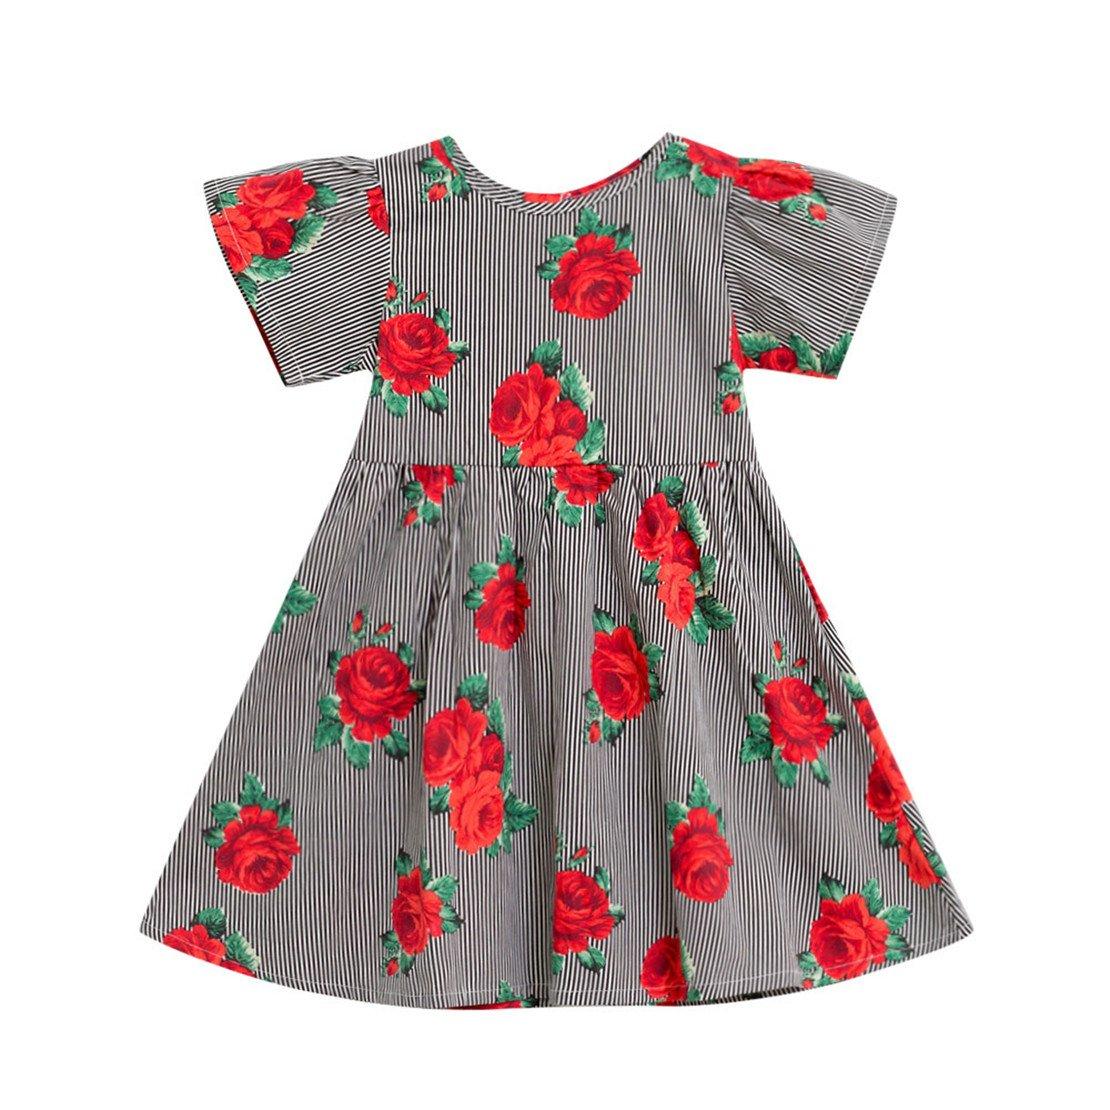 ZHANGVIP Infant Toddler Kids Baby Girls Floral Cartoon Printed Sleeveless Clothes Princess Dress Mini Skirt (6T, Red)